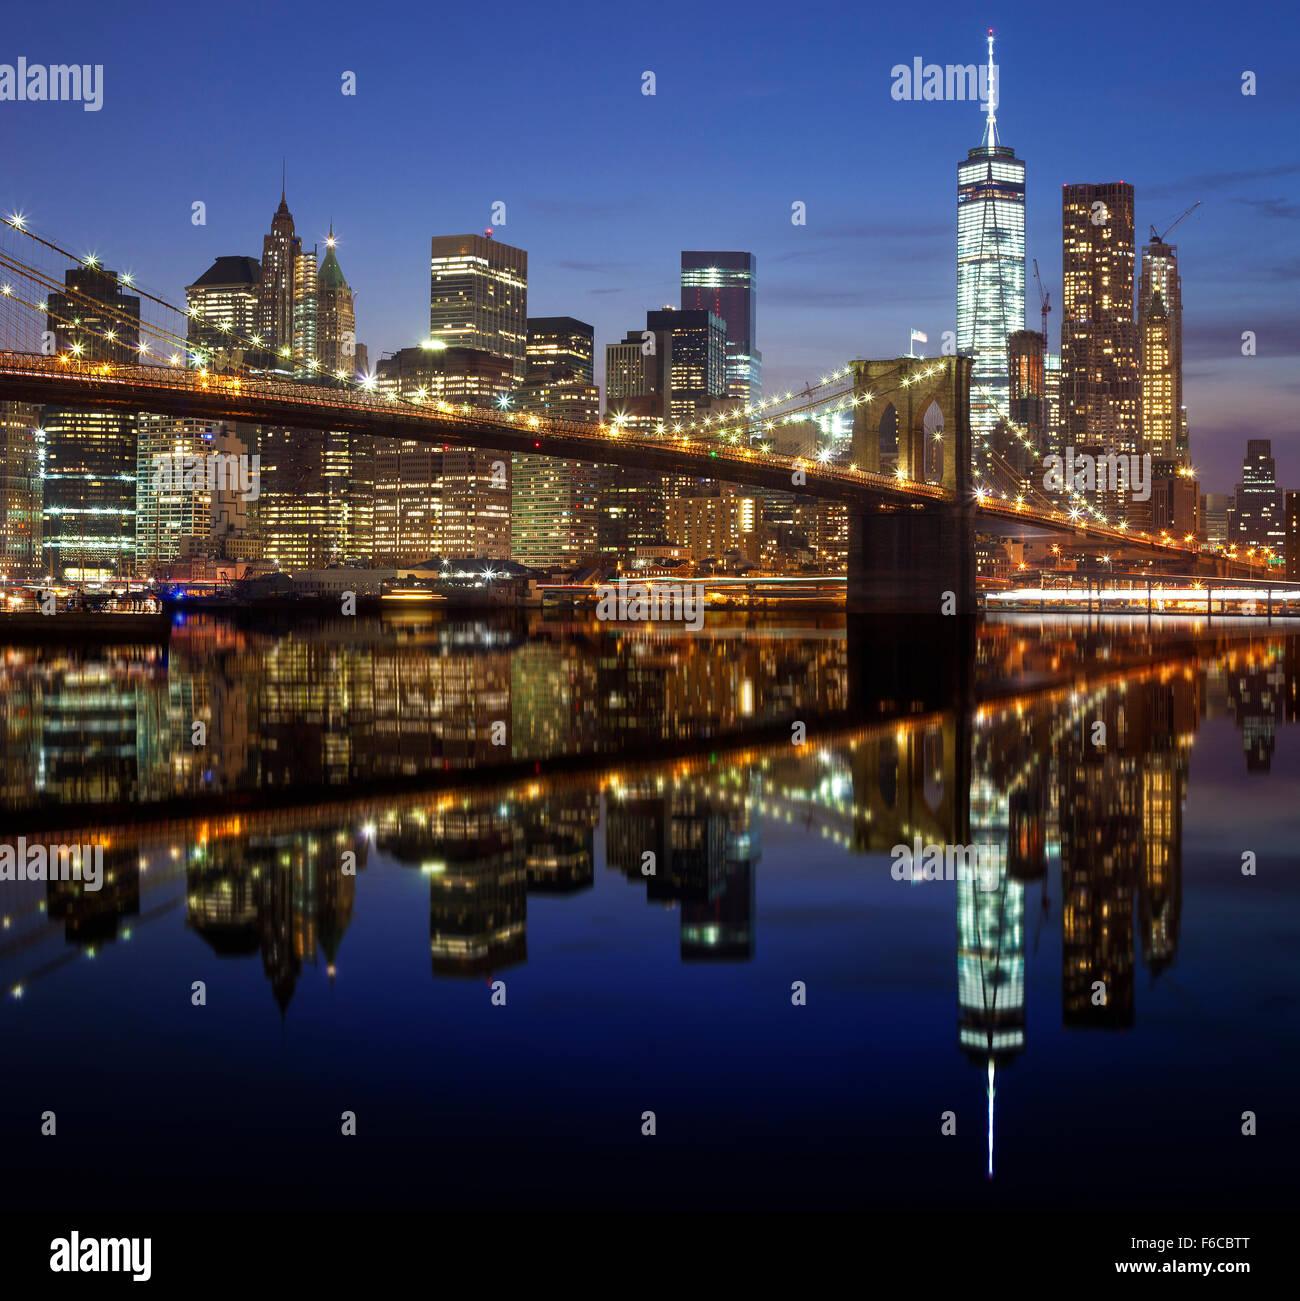 Manhattan waterfront reflète dans l'eau la nuit, New York City, USA. Photo Stock